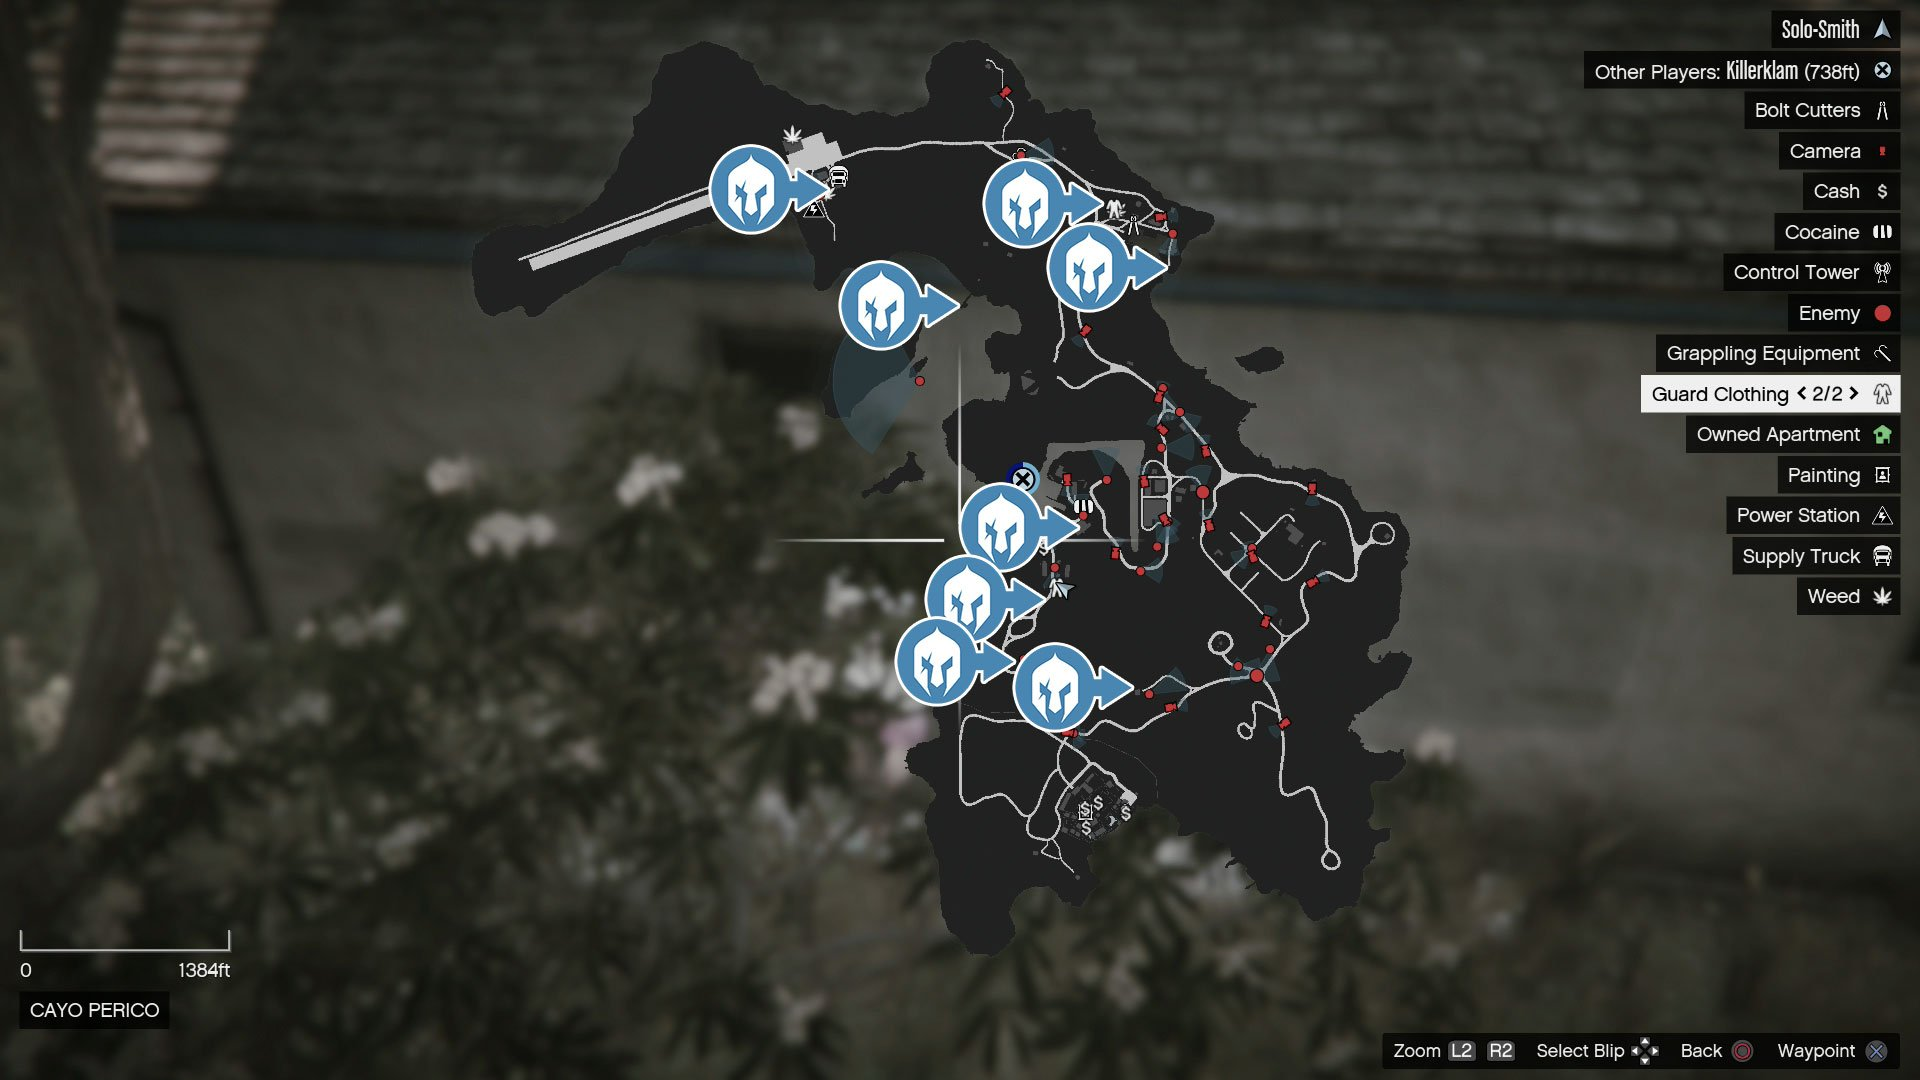 Map of guardwear location